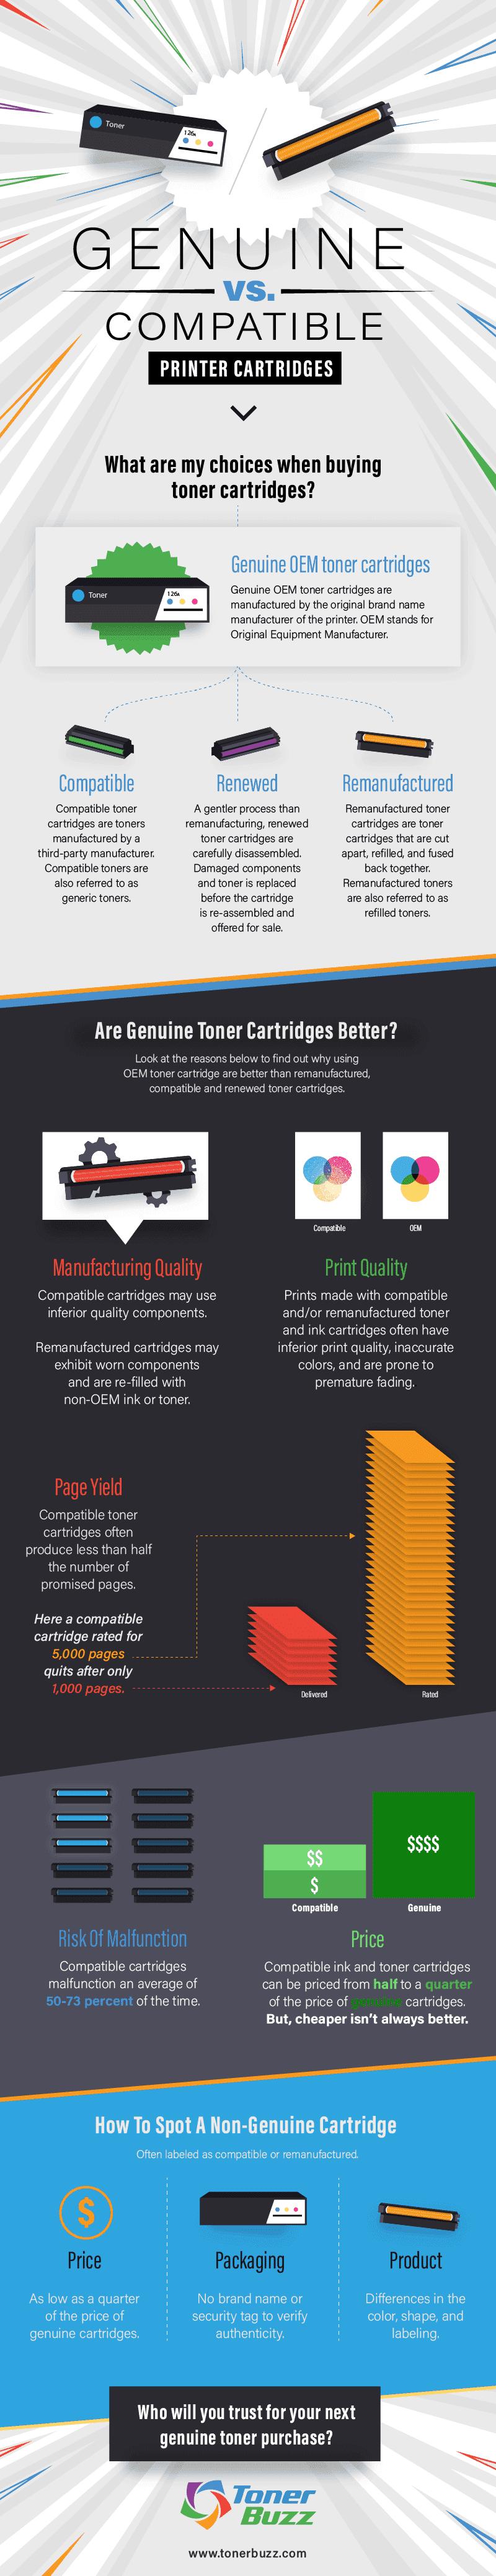 Genuine OEM vs. Compatible vs. Remanufactured #infographic